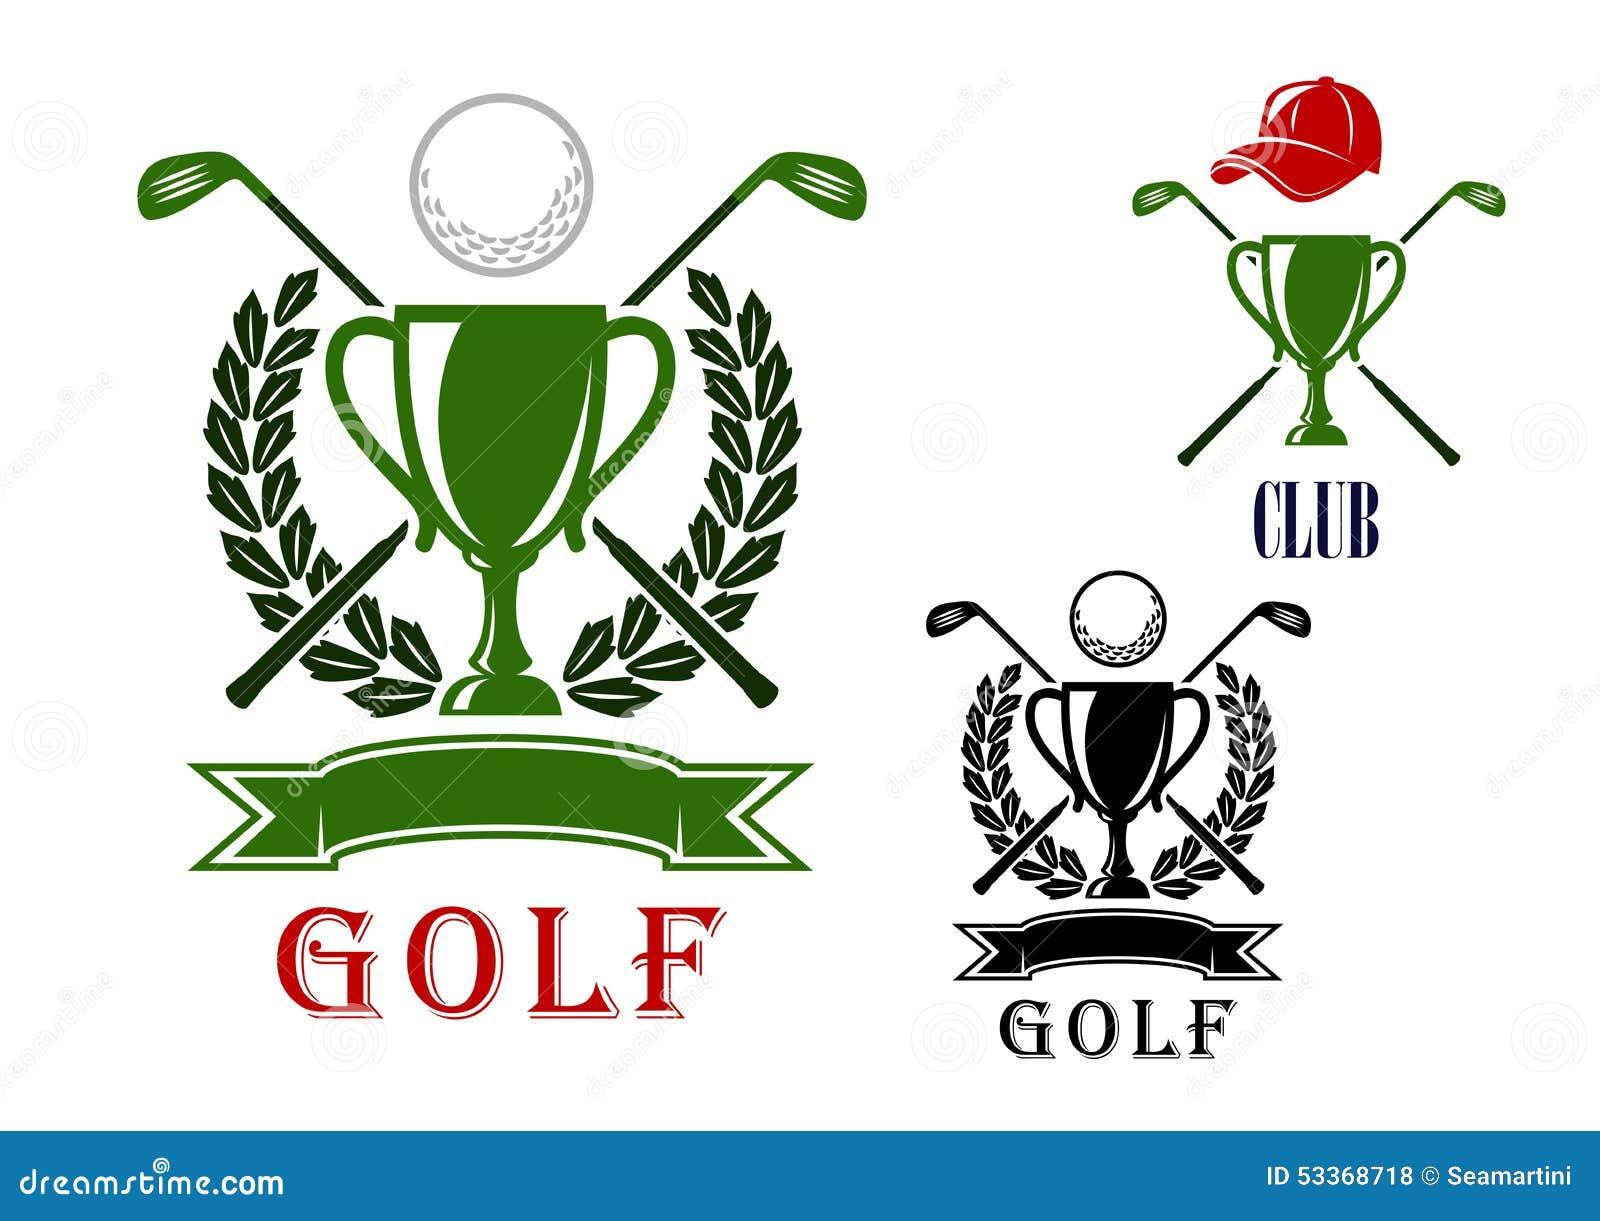 golf emblem and badges design templates stock vector